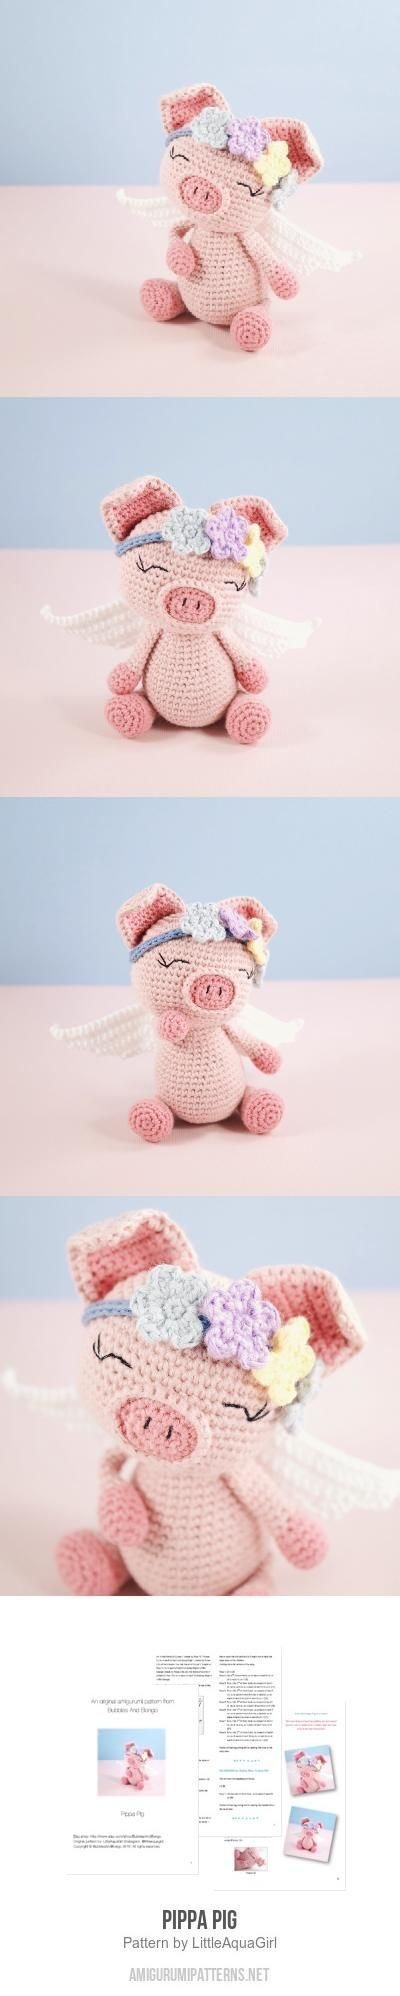 Melissa's Crochet Designs: Pippa Pig amigurumi pattern by LittleAquaGirl